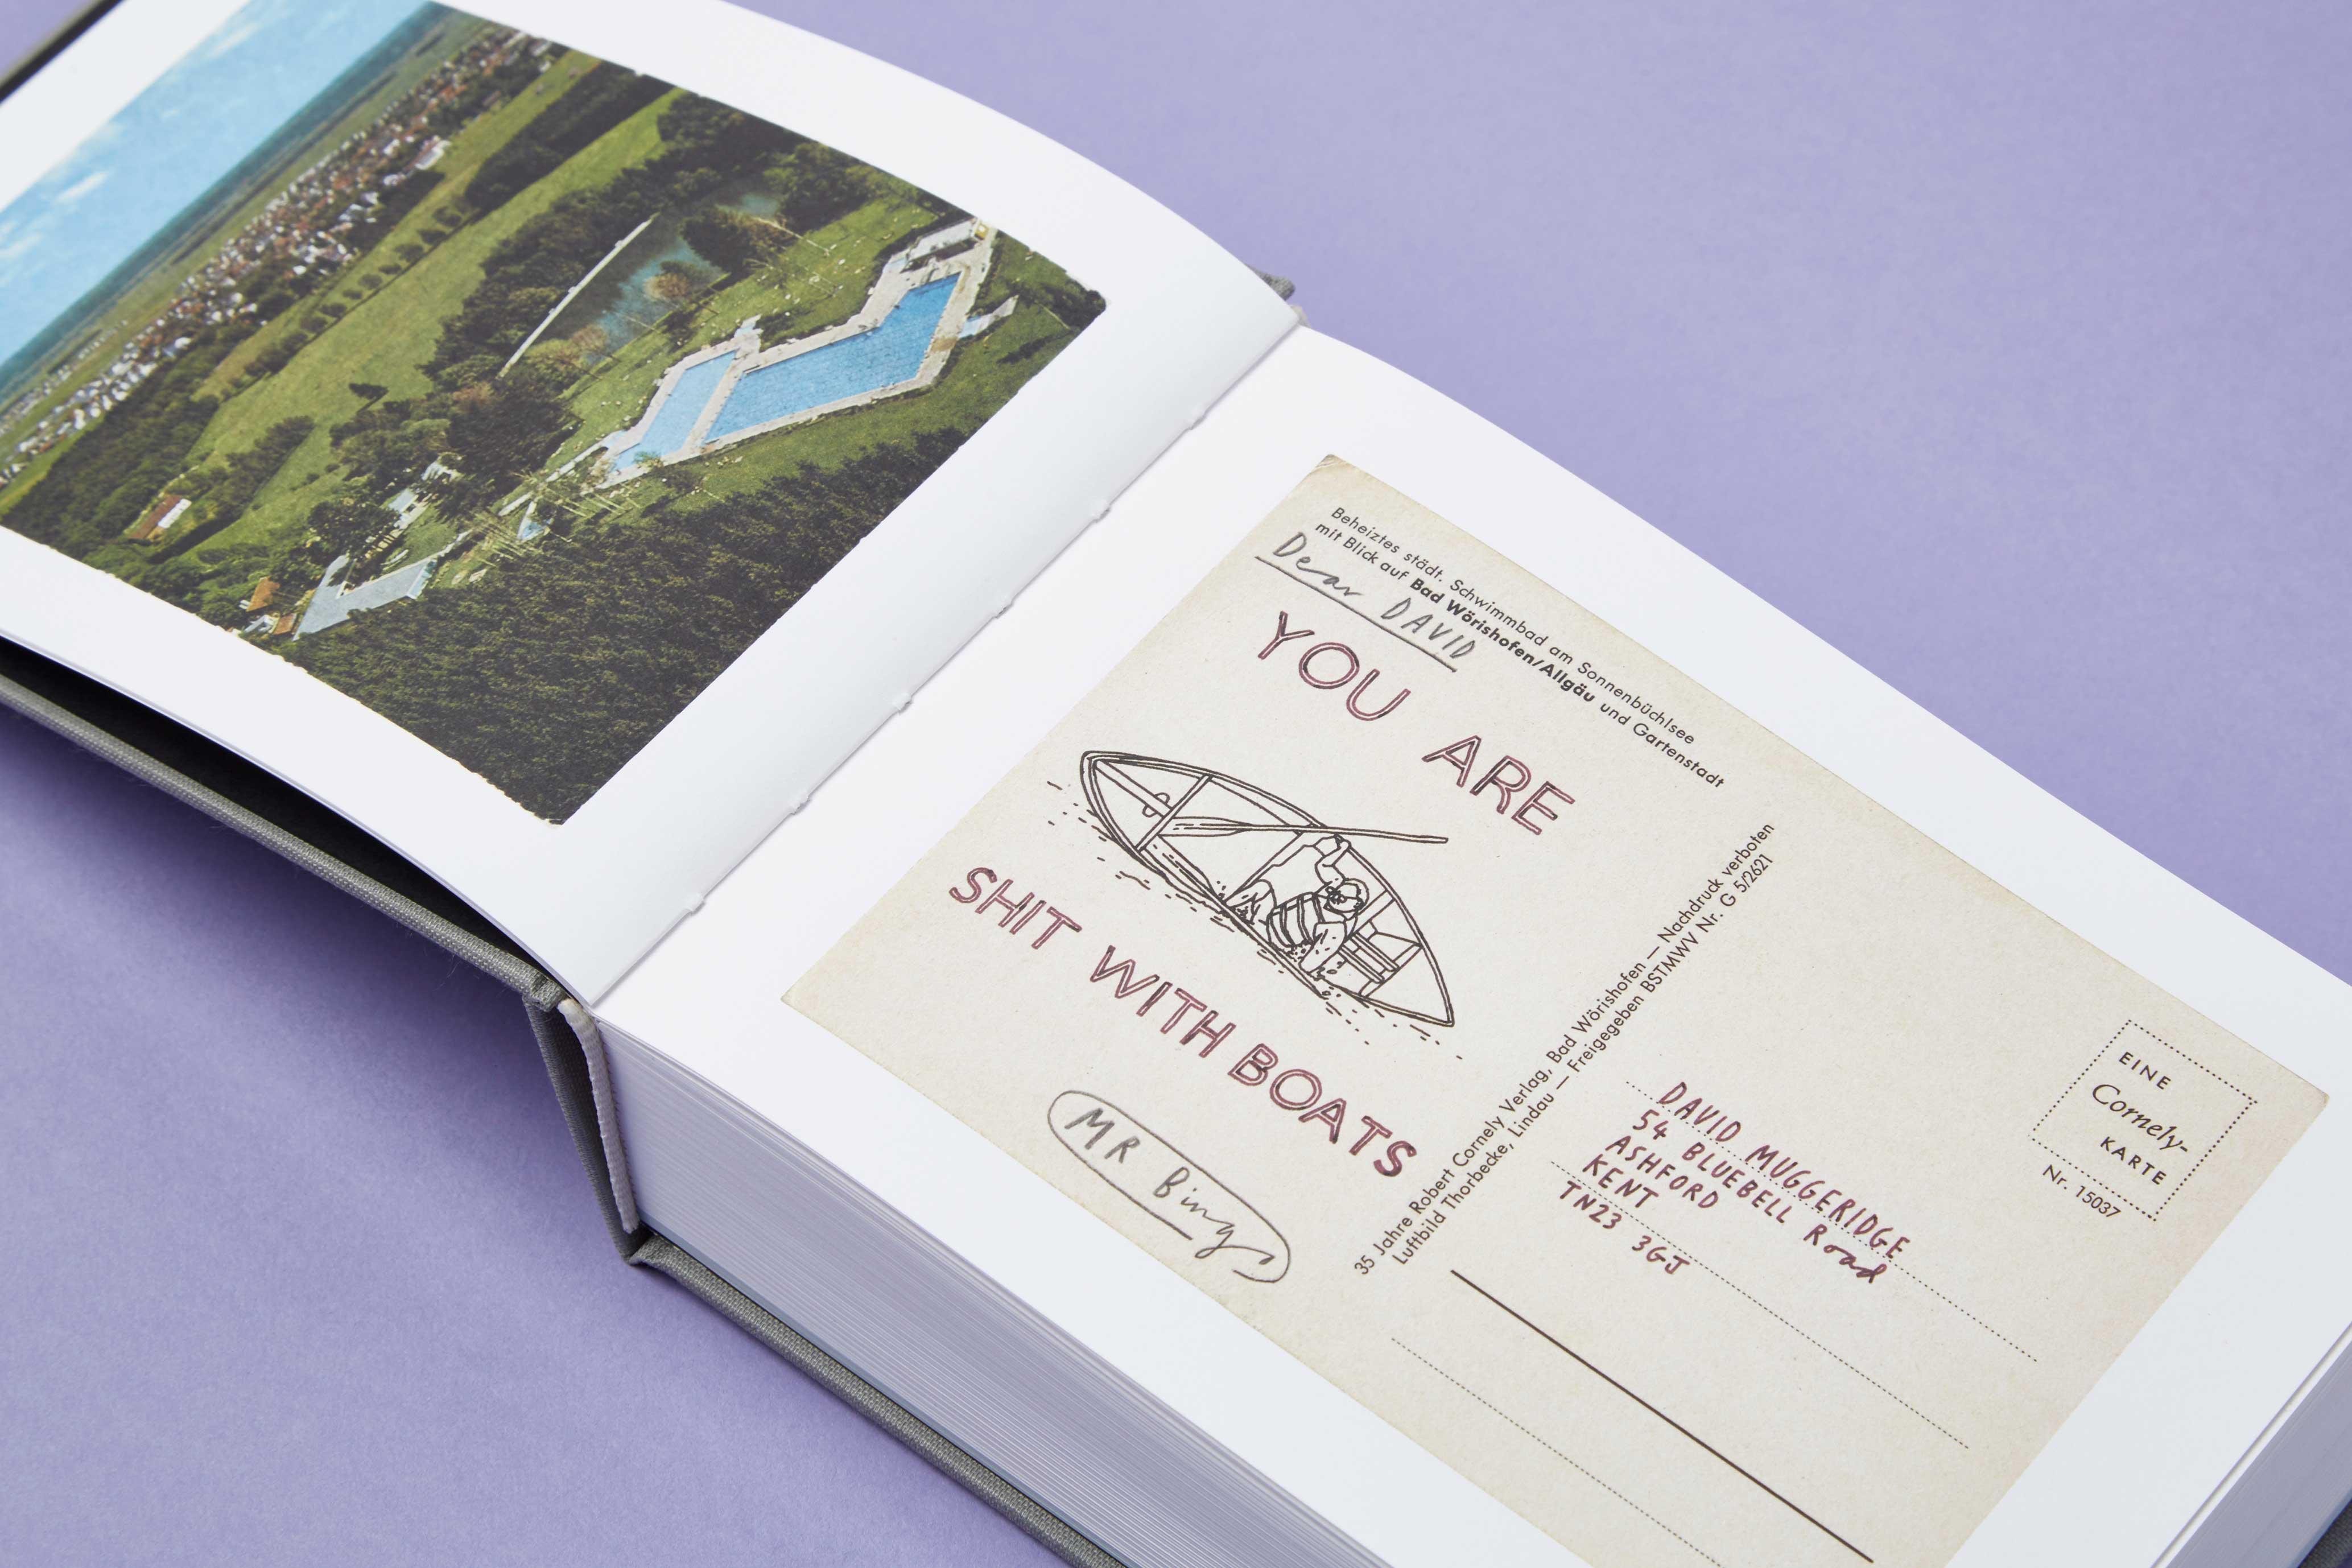 Mr-B_Hate-Mail-Book-photo-02